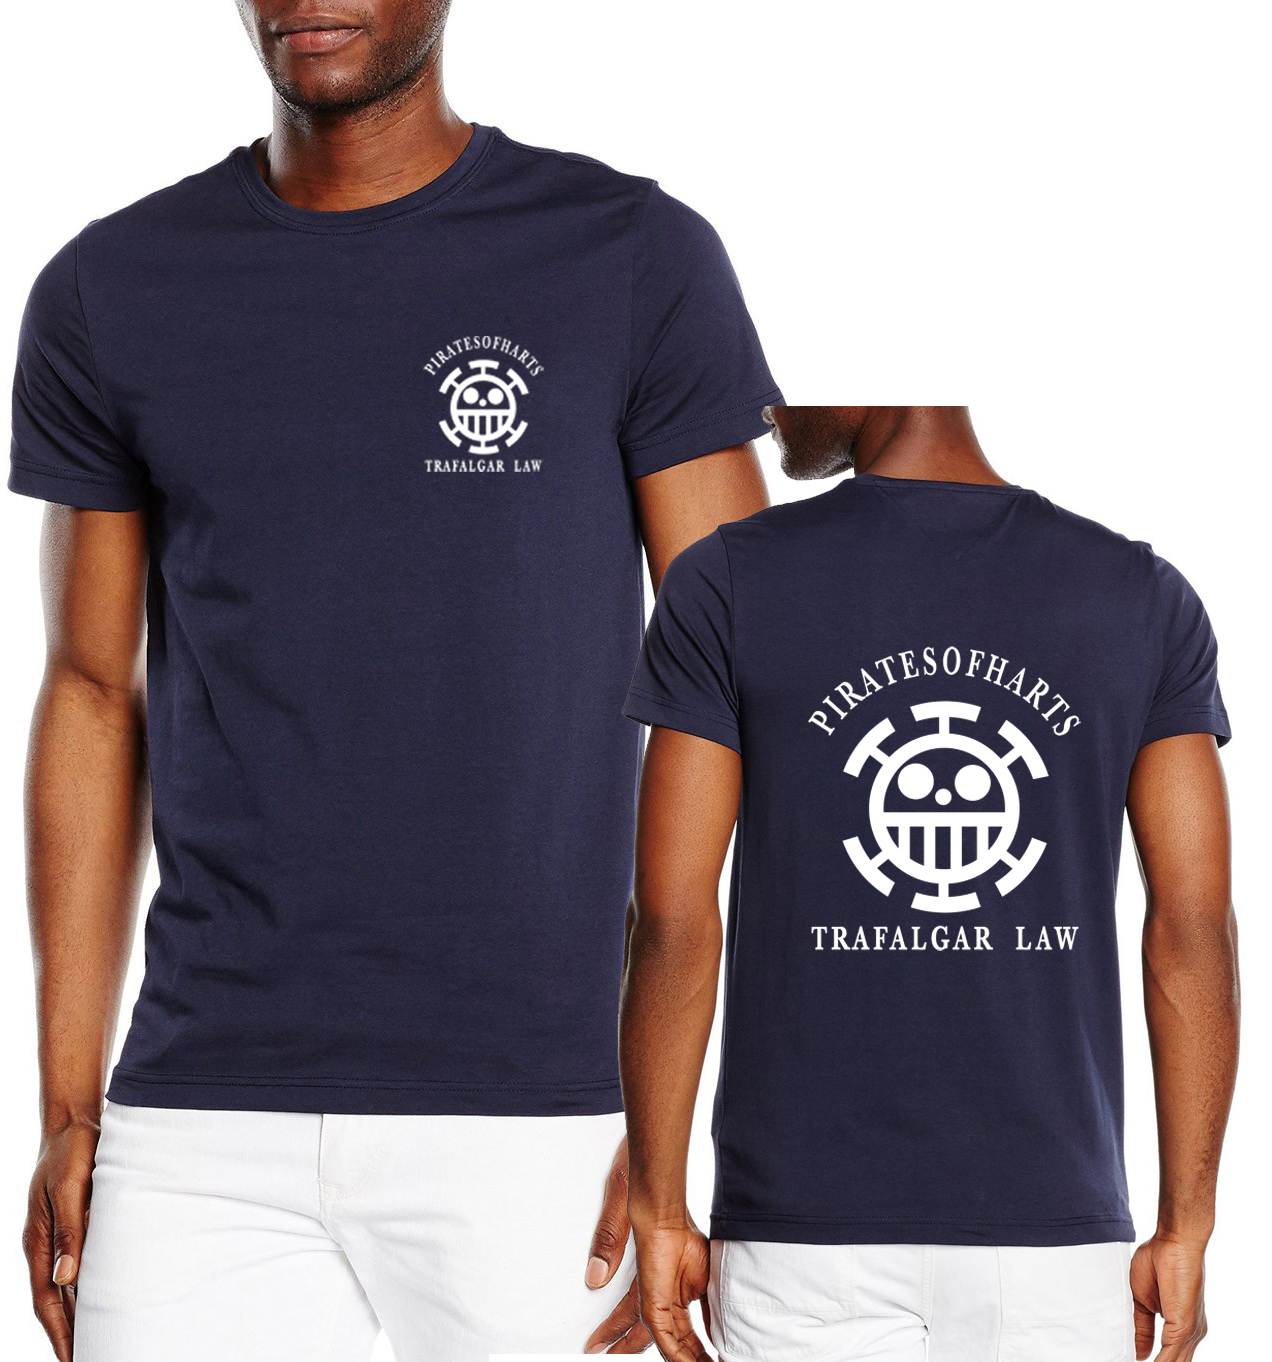 Anime One Piece Trafalgar Law Death Surgeon T-Shirt man brand  T Shirt Men 2019 New summer Cotton Casual Tops Tee Short Sleeve